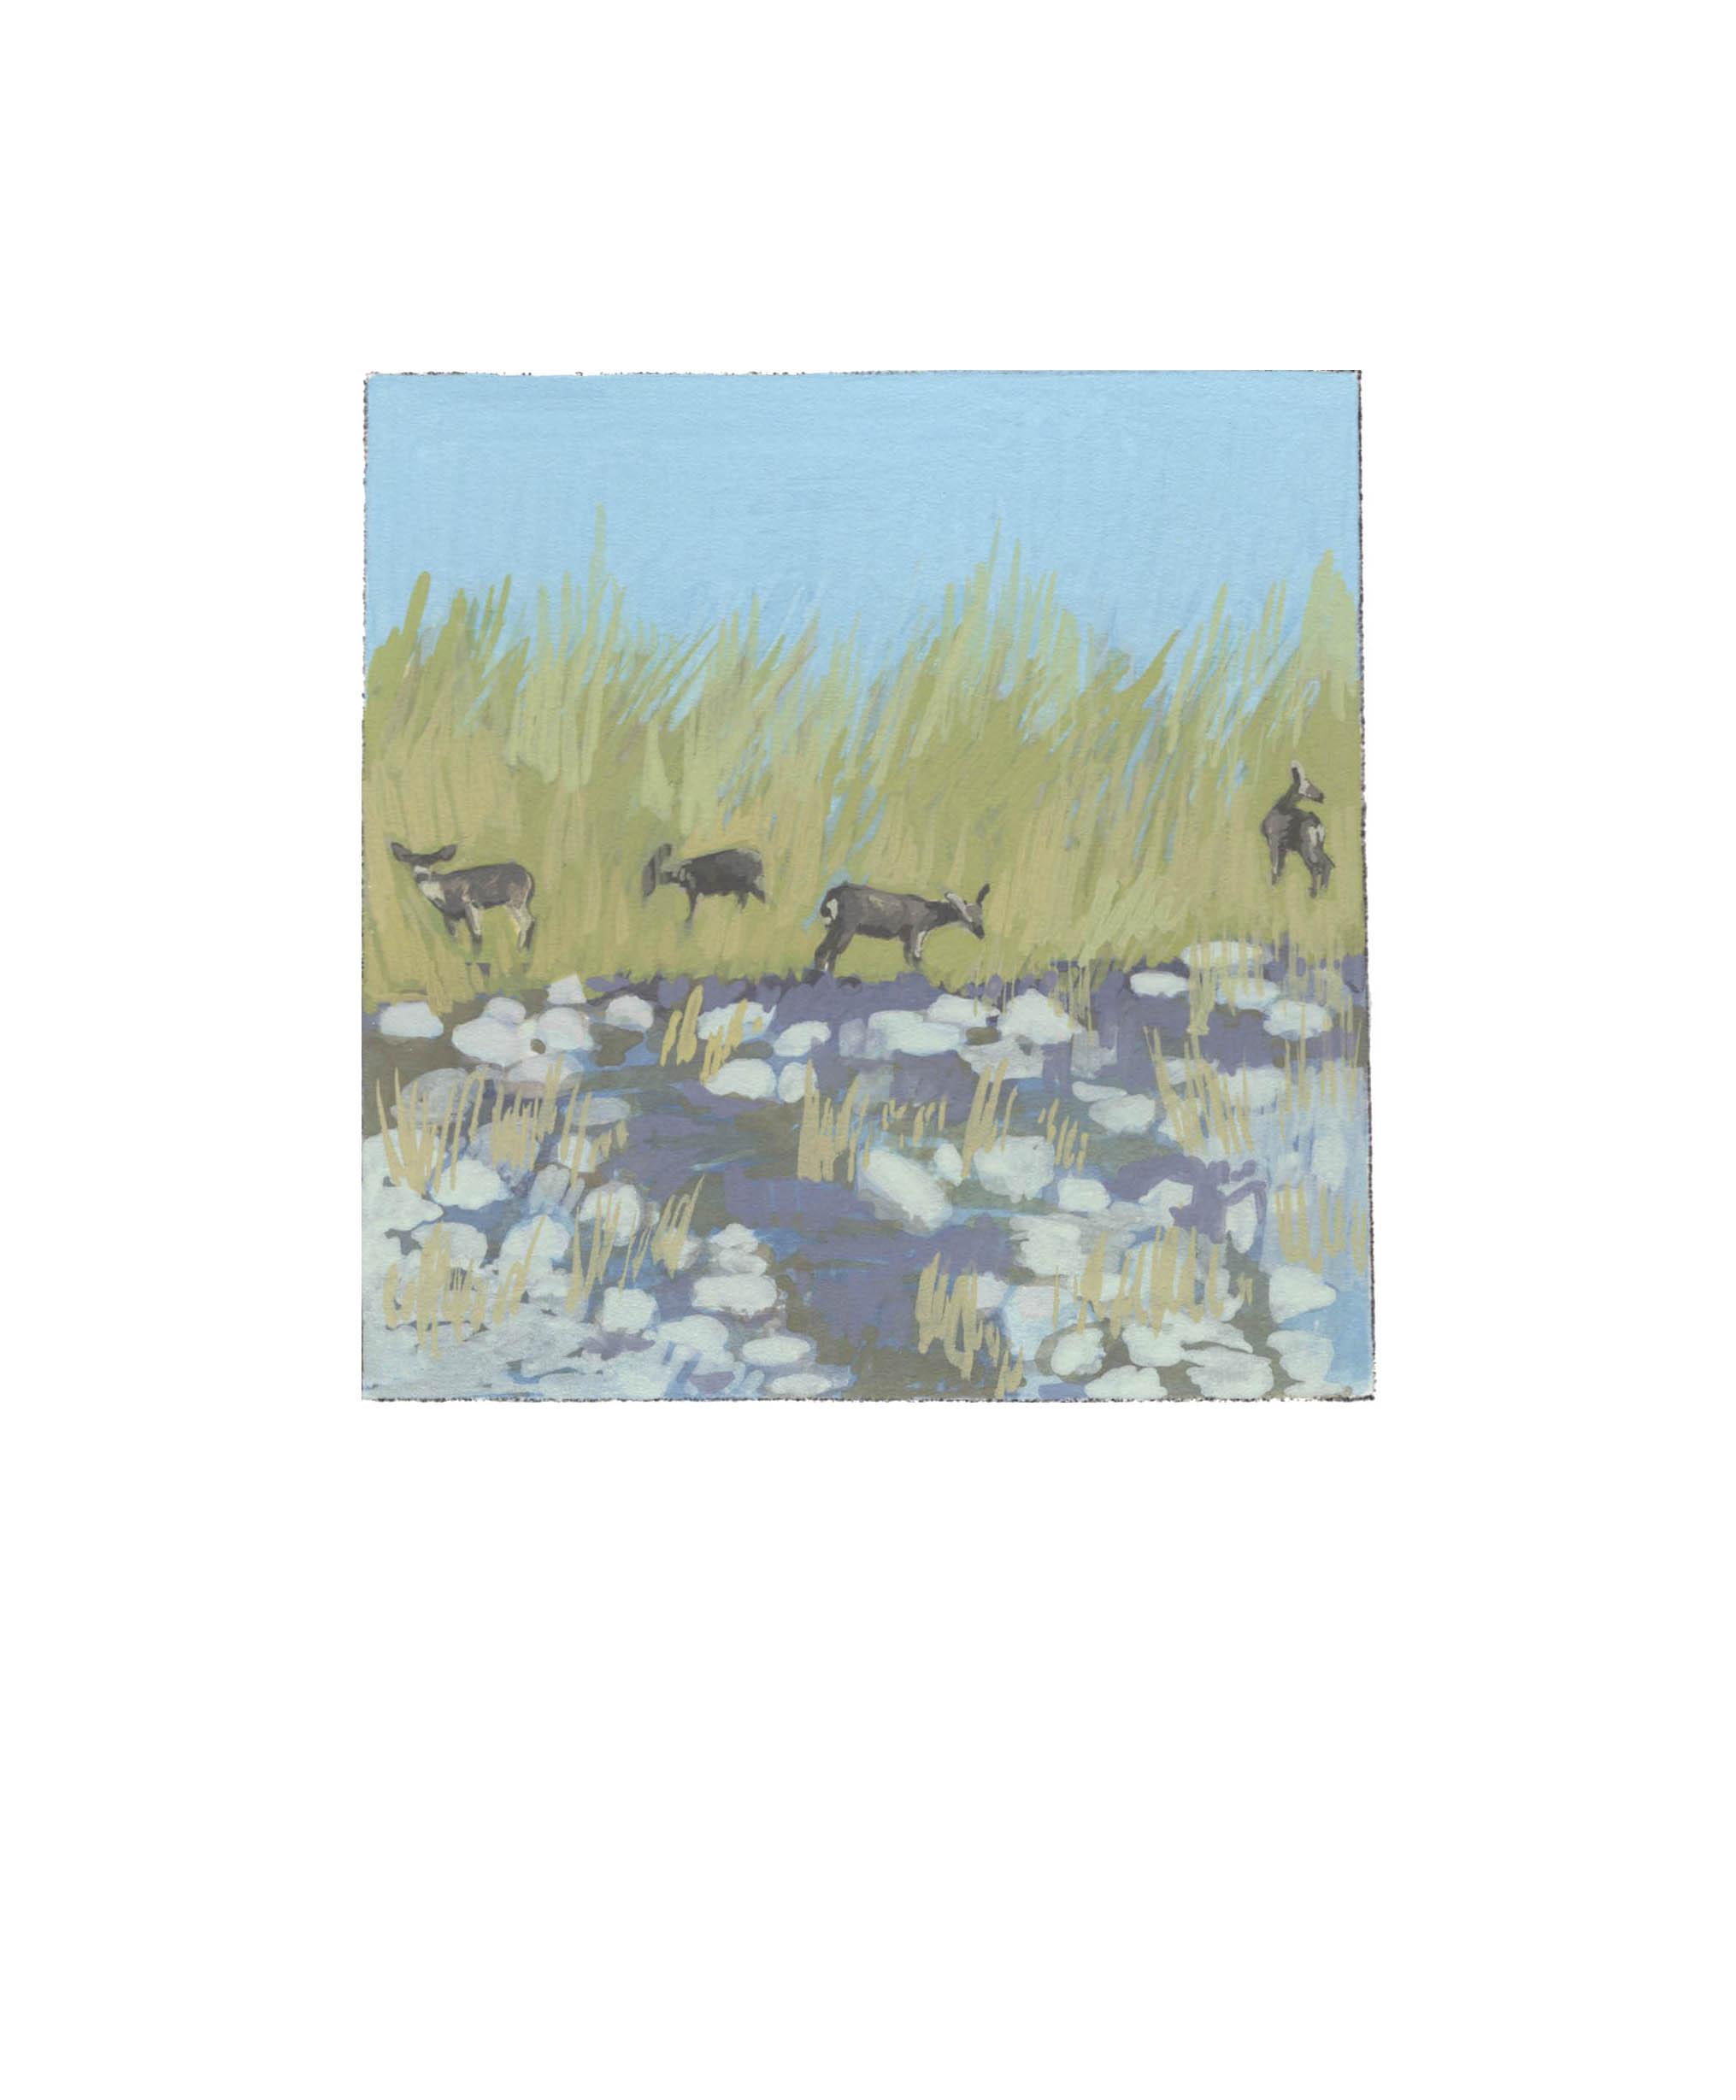 Cachuma Mule Deer